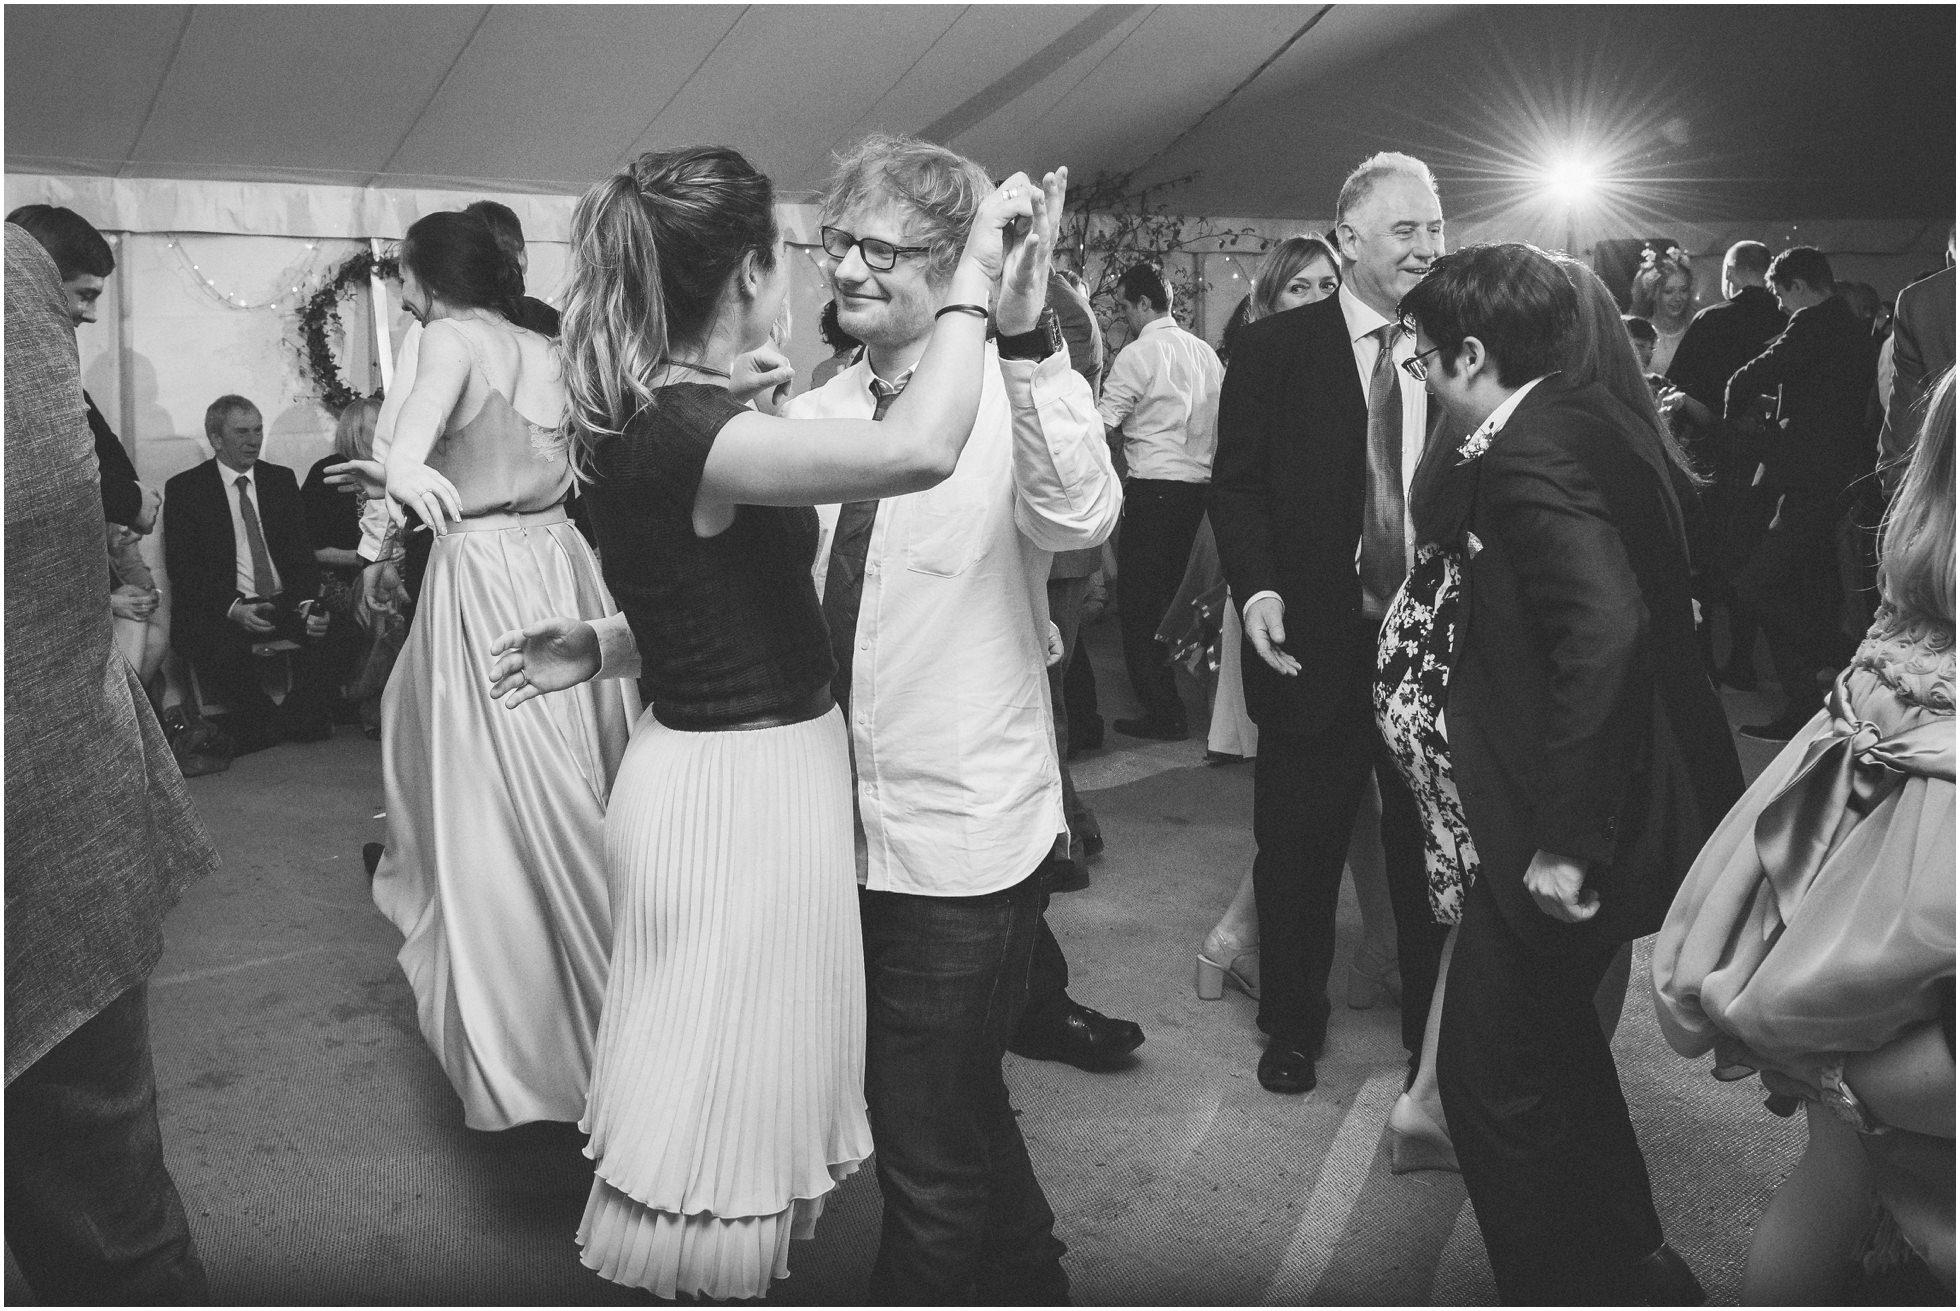 Ed Sheeran and his girlfriend dancing the night away at a York Wedding Photographer's dream wedding